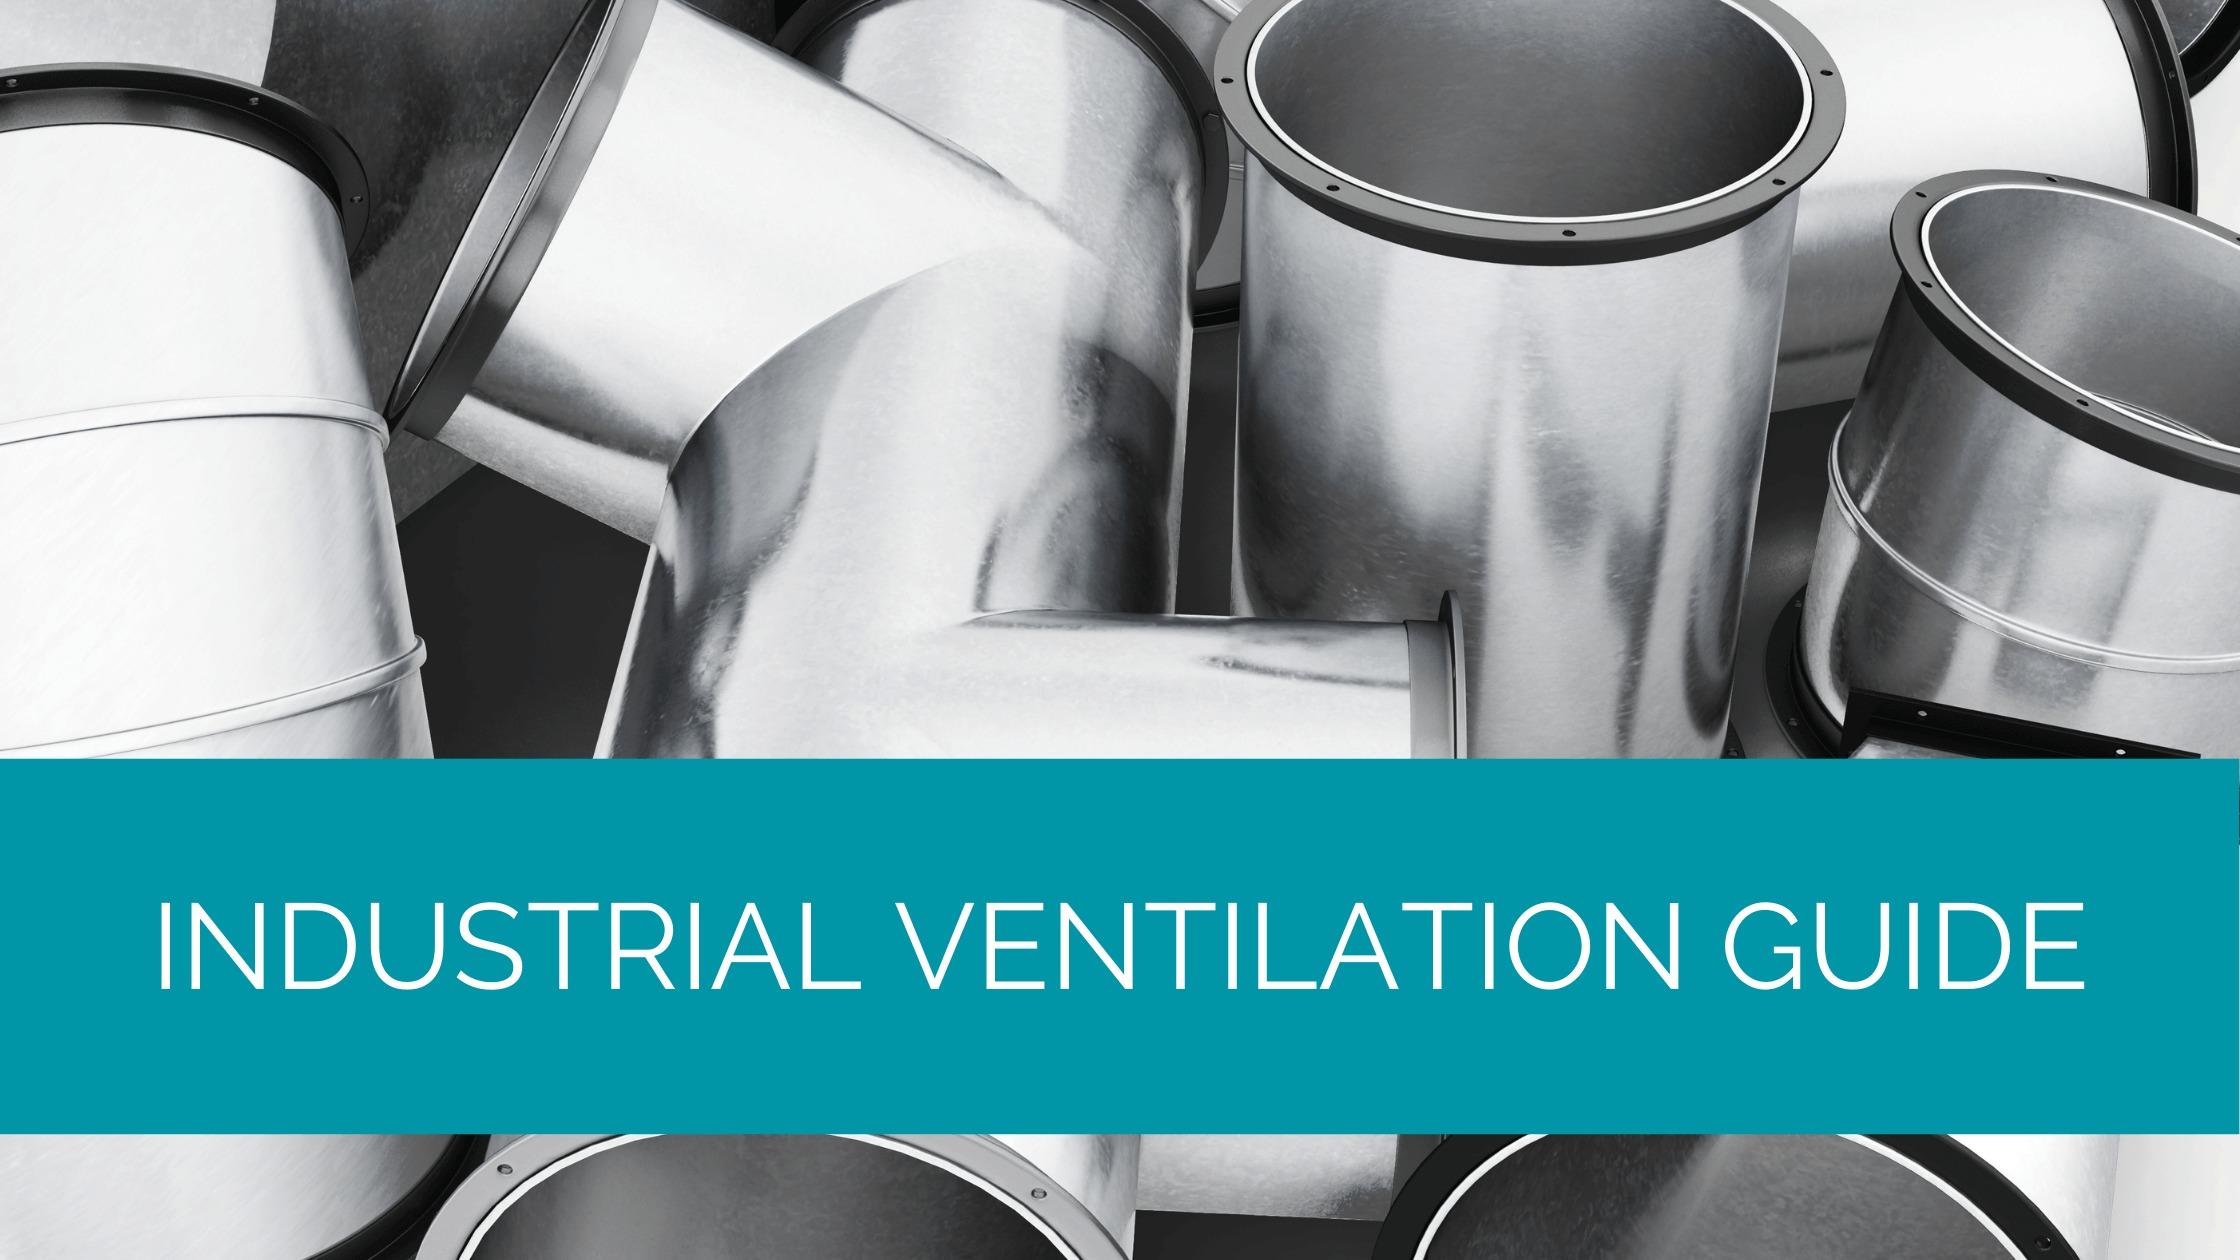 Industrial Ventilation Guide